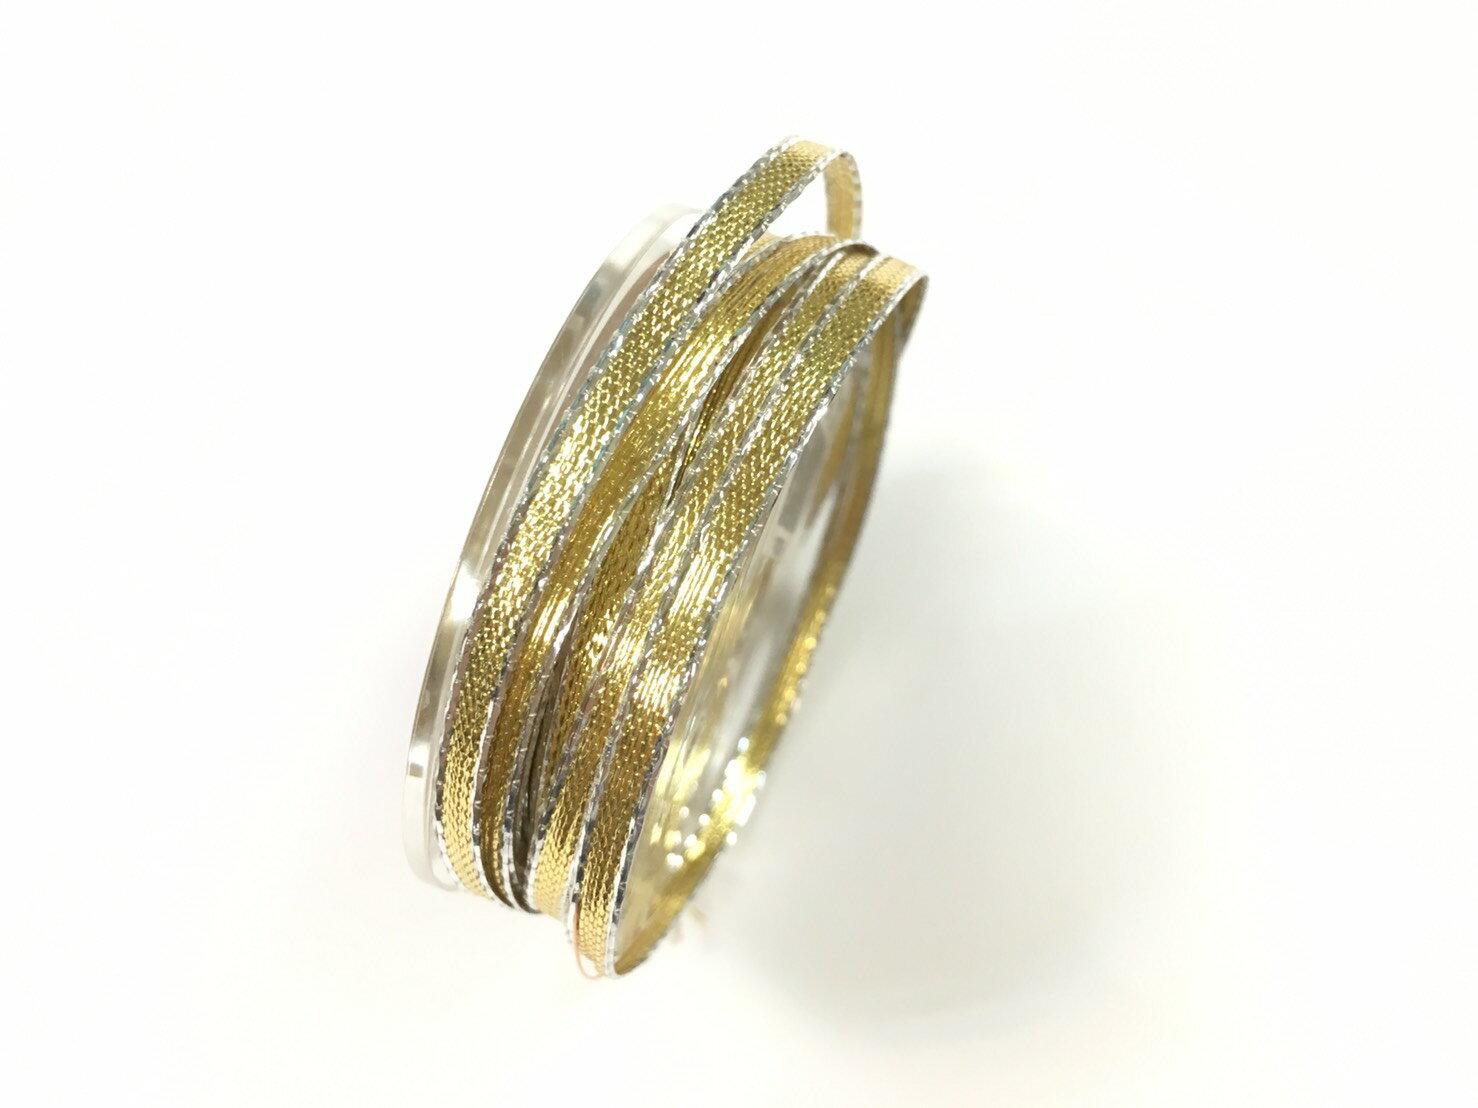 【Crystal Rose緞帶專賣店】 金屬彩邊鐵絲緞帶 3mm 3碼 (4色) 3